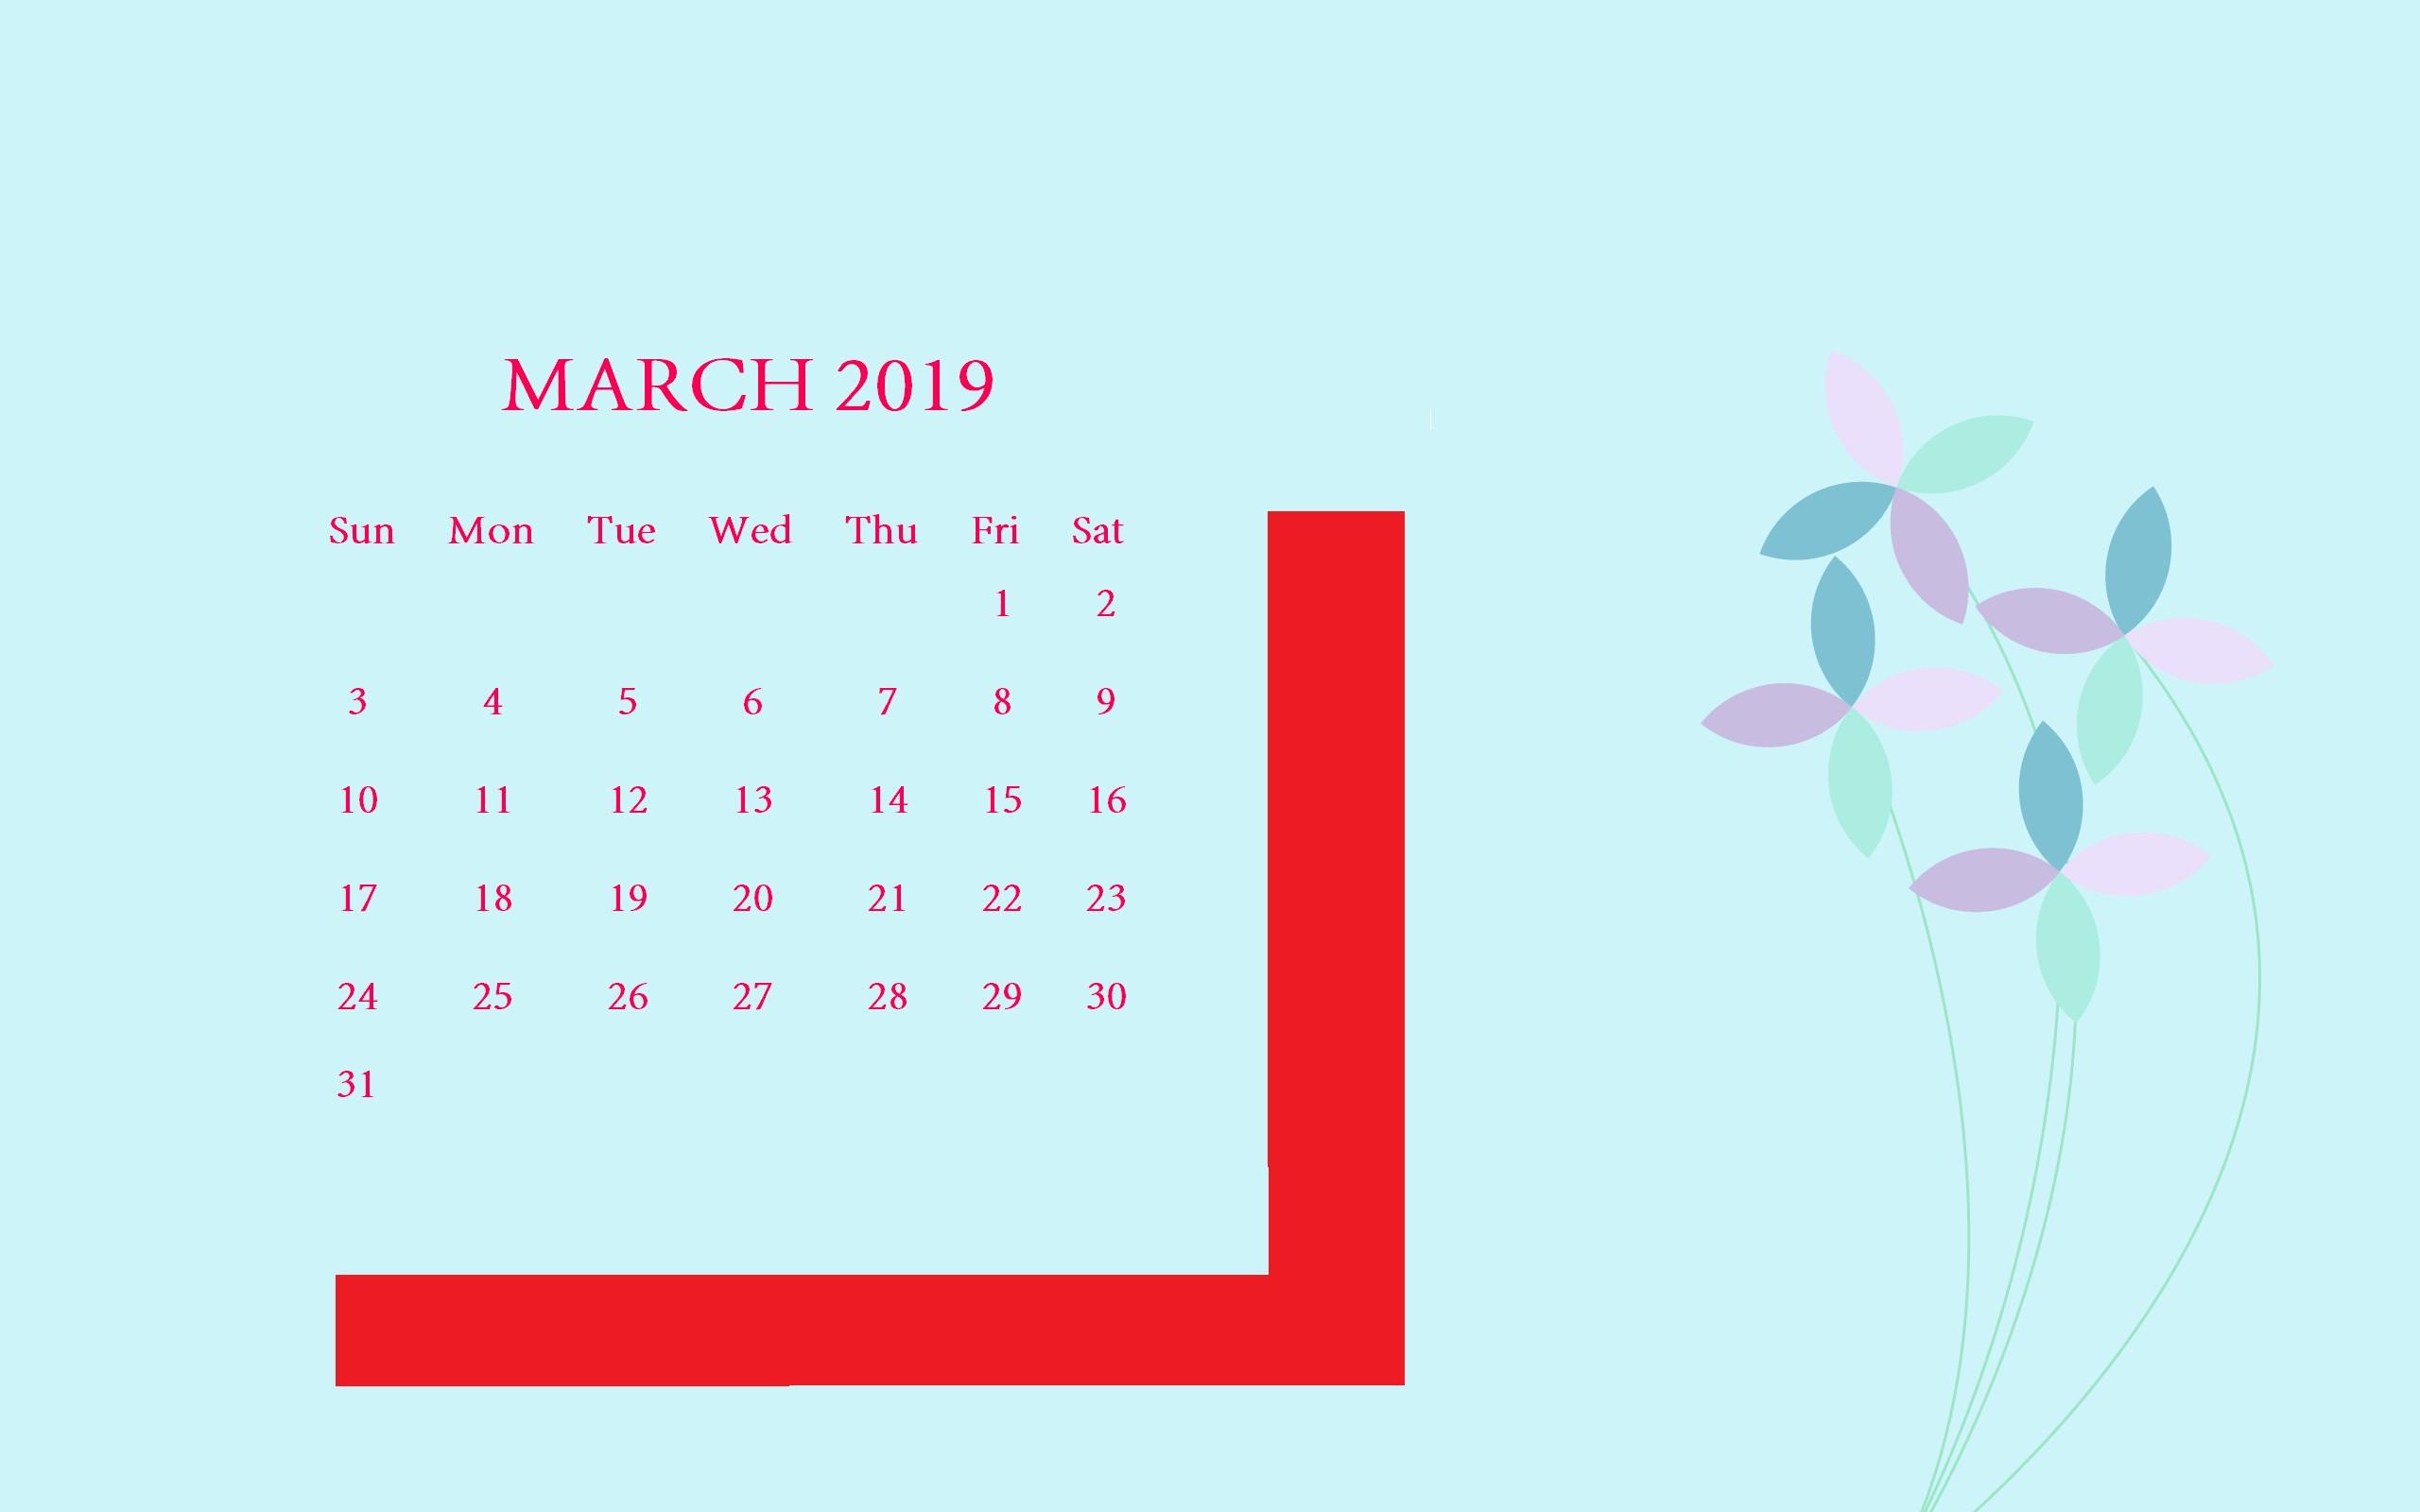 2019 March Calendar Malaysia Más Arriba-a-fecha Flowers March 2019 Desktop Calendar March March2019 Of 2019 March Calendar Malaysia Más Actual 2019 softail Motorcycles